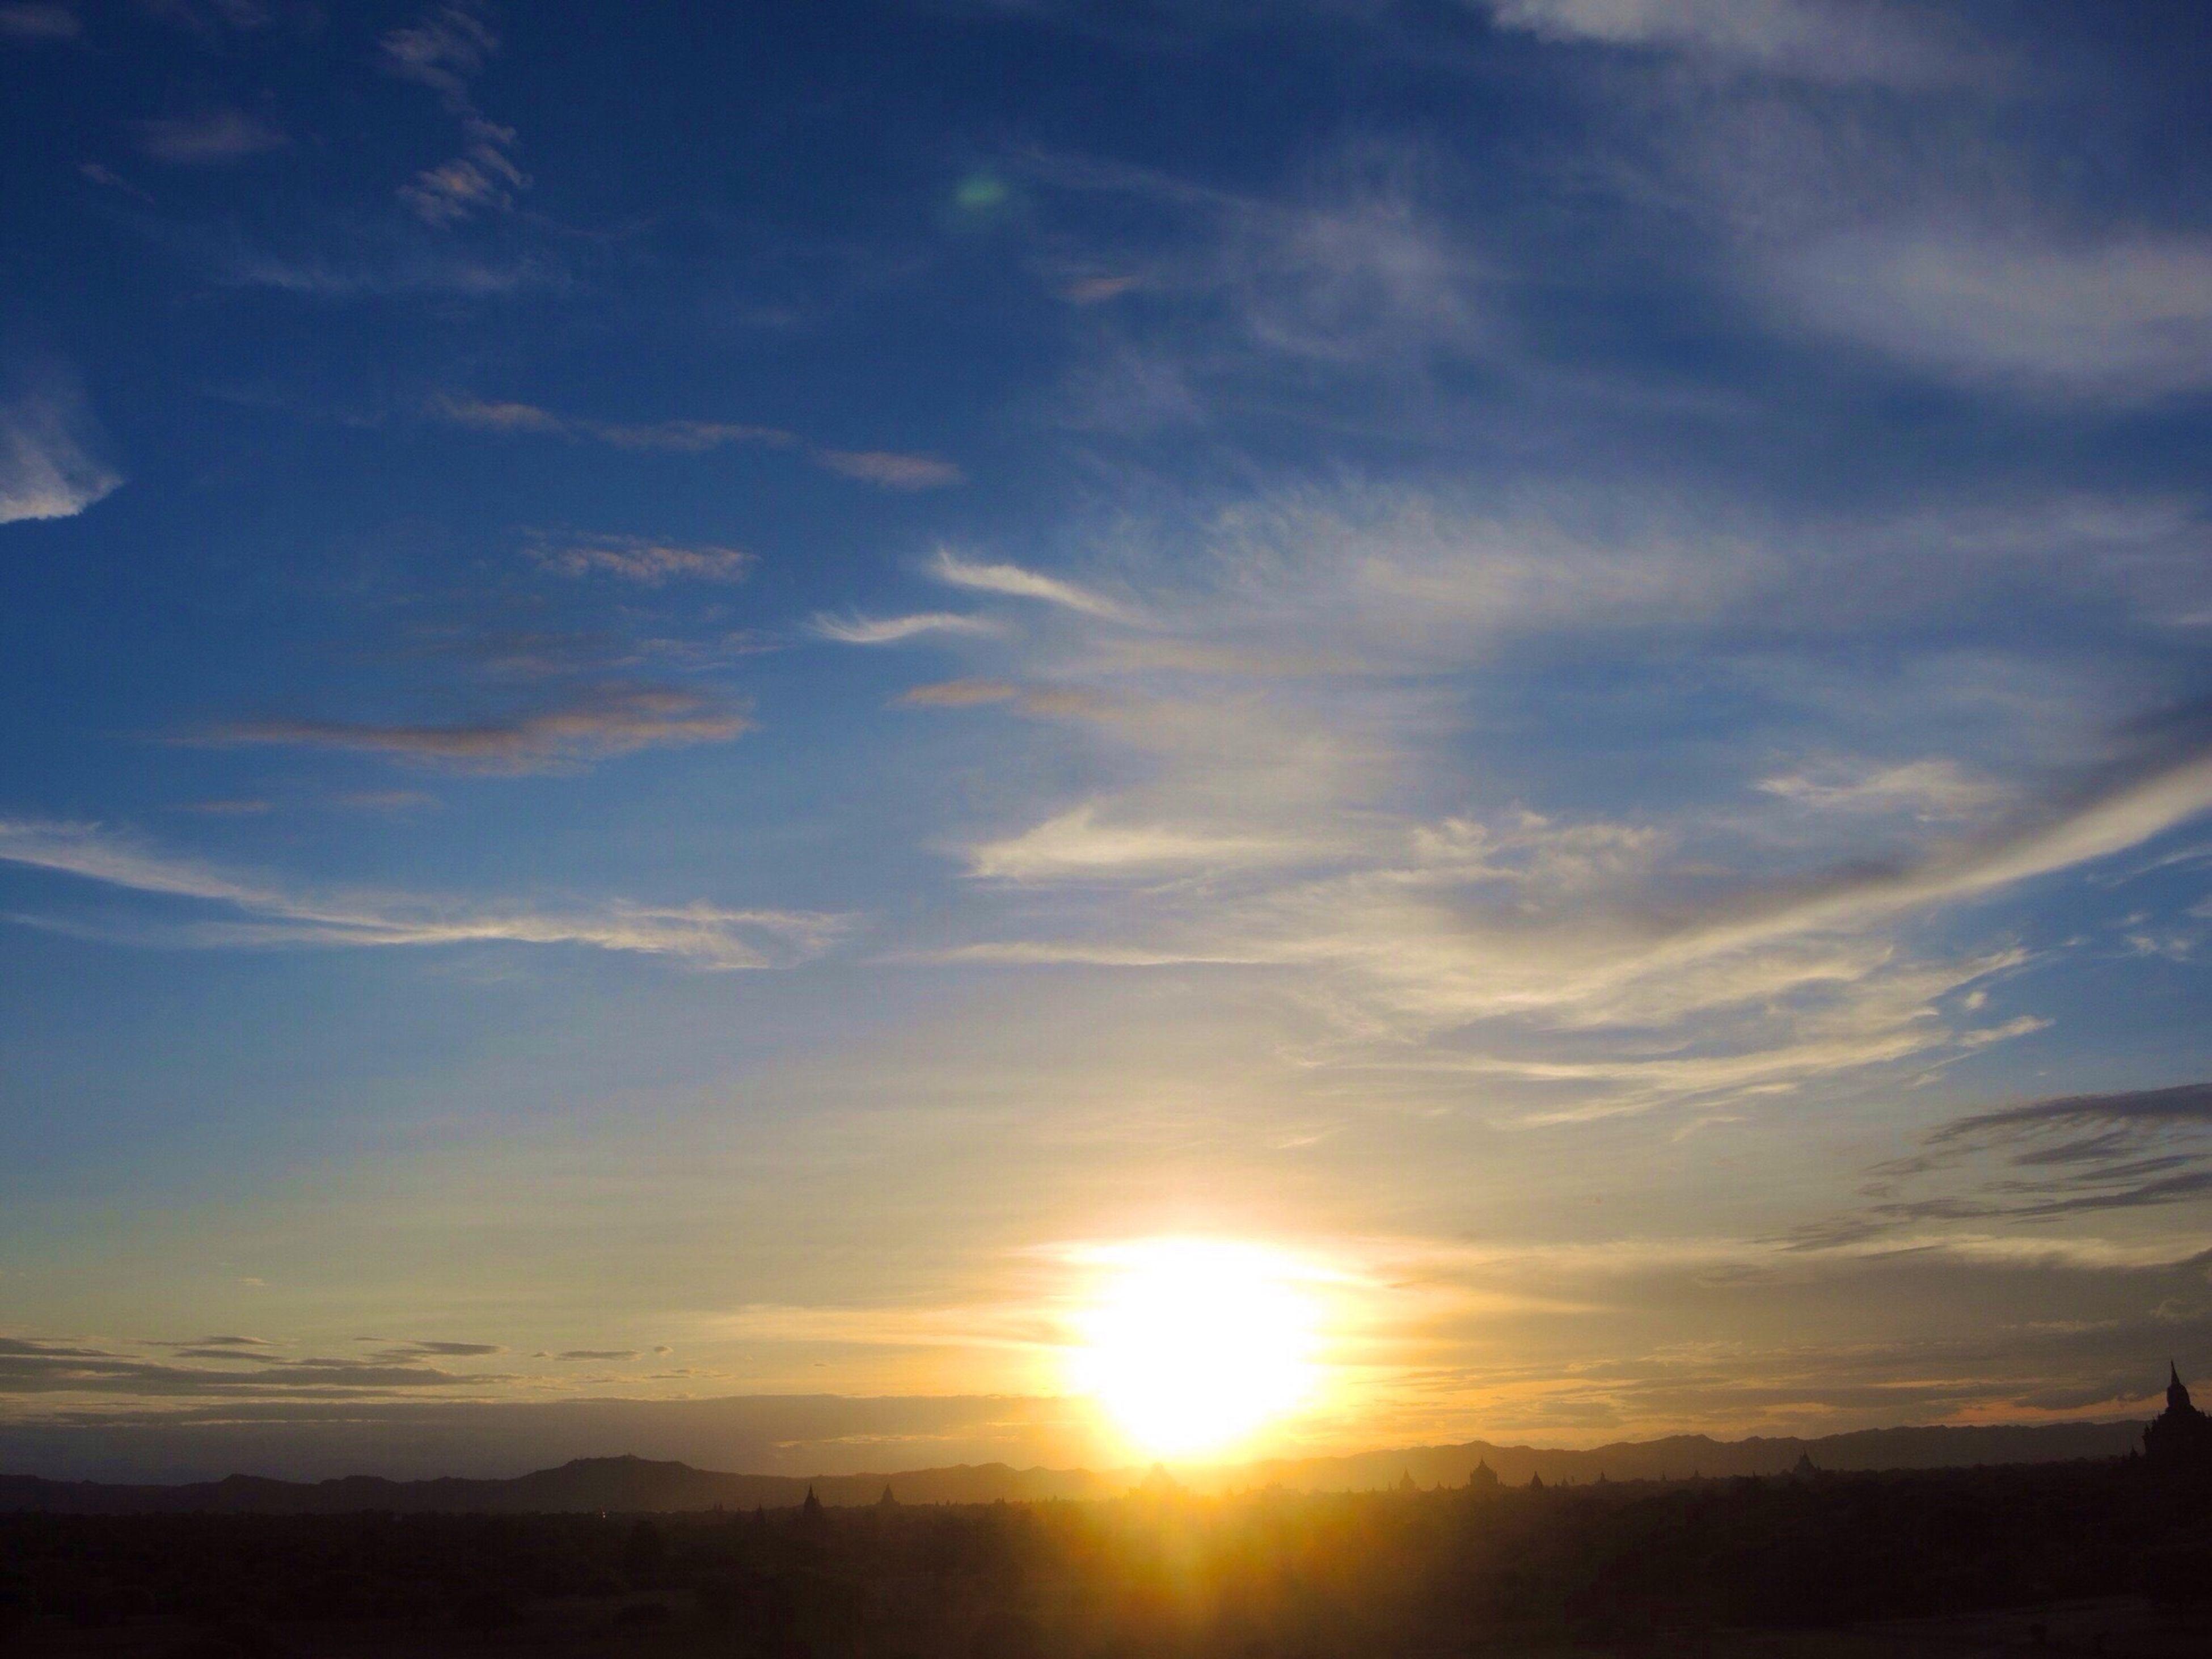 sunset, sun, sky, tranquil scene, scenics, tranquility, silhouette, beauty in nature, landscape, sunbeam, cloud - sky, sunlight, nature, idyllic, cloud, lens flare, mountain, non-urban scene, outdoors, no people